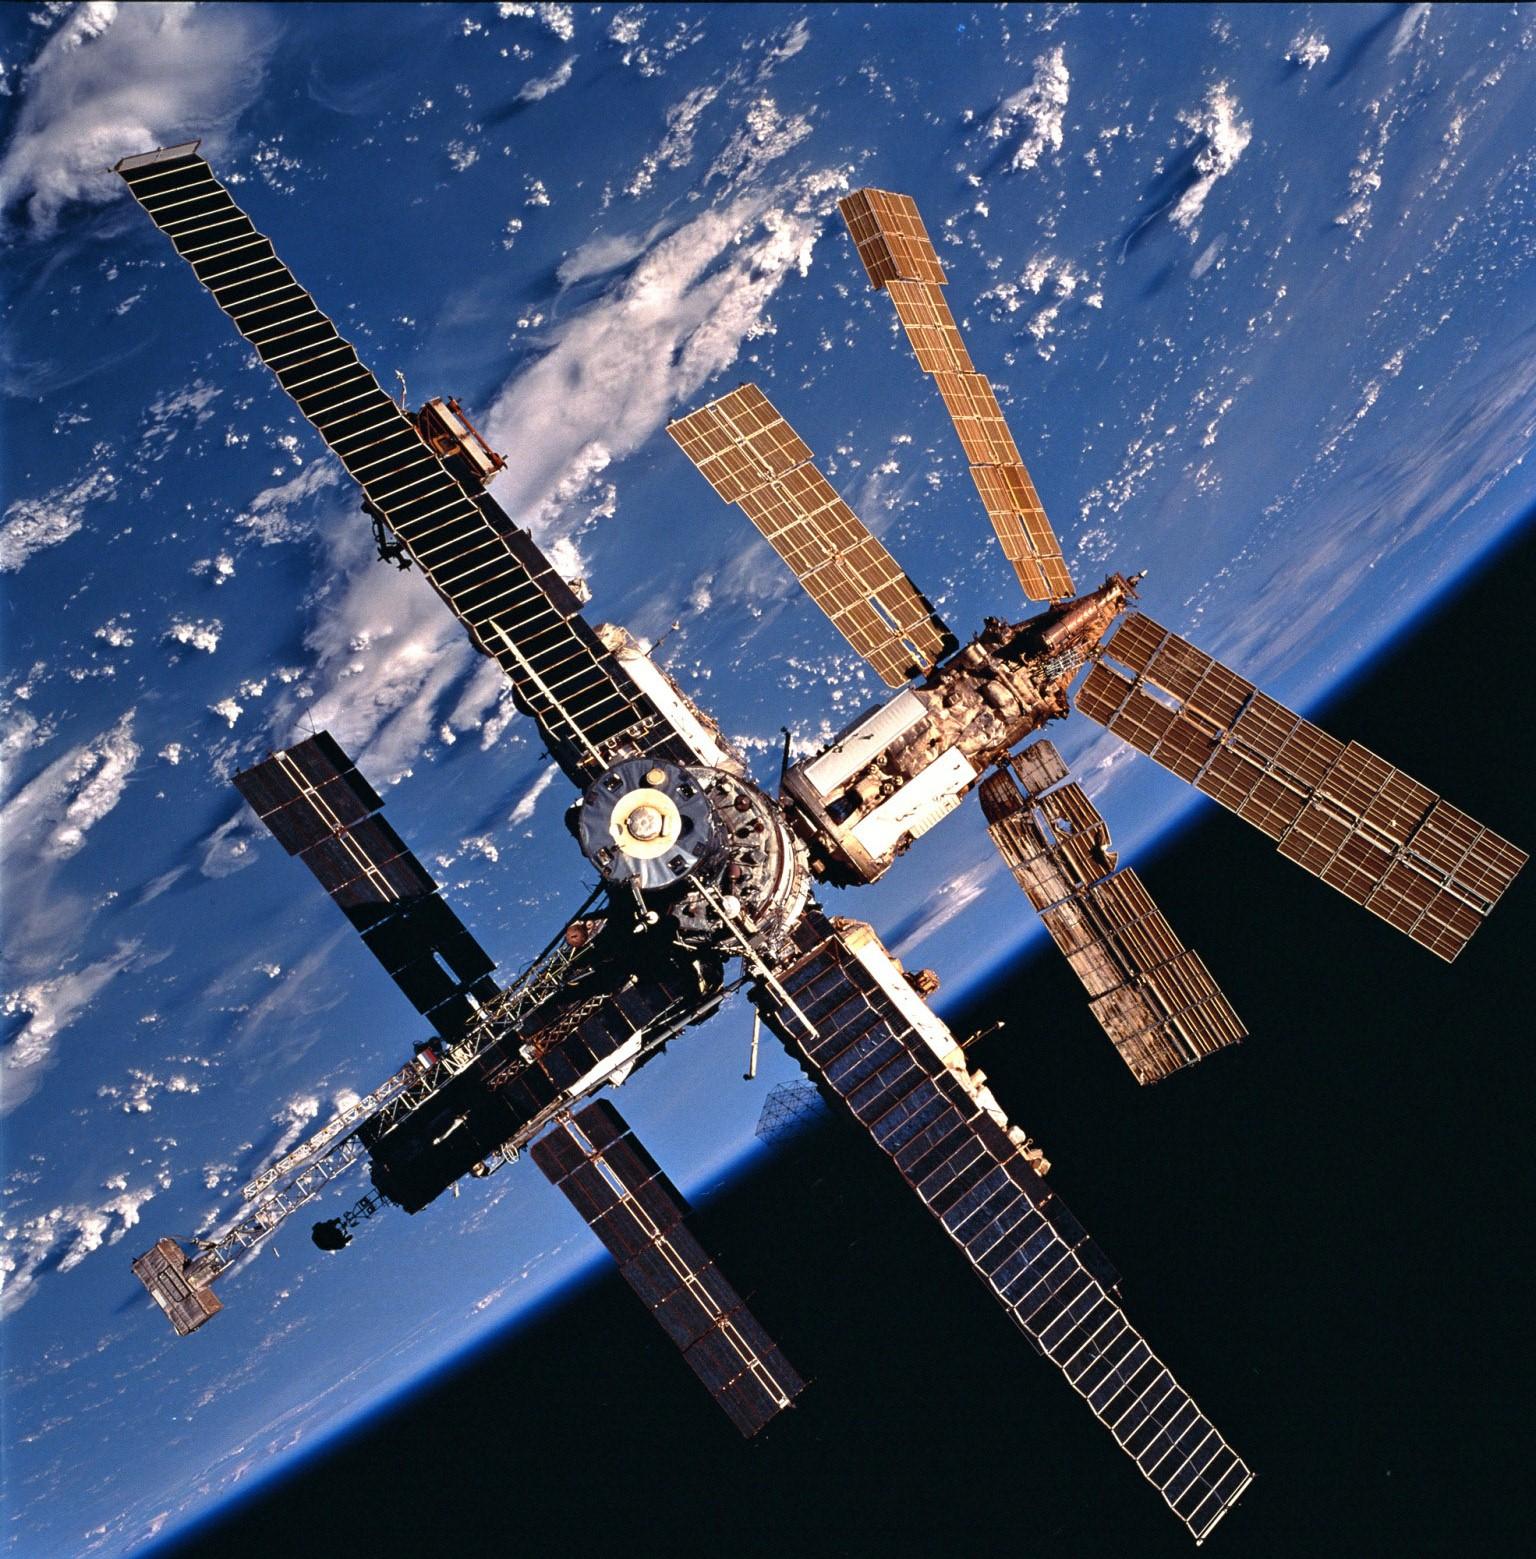 mir space station blueprint - photo #31